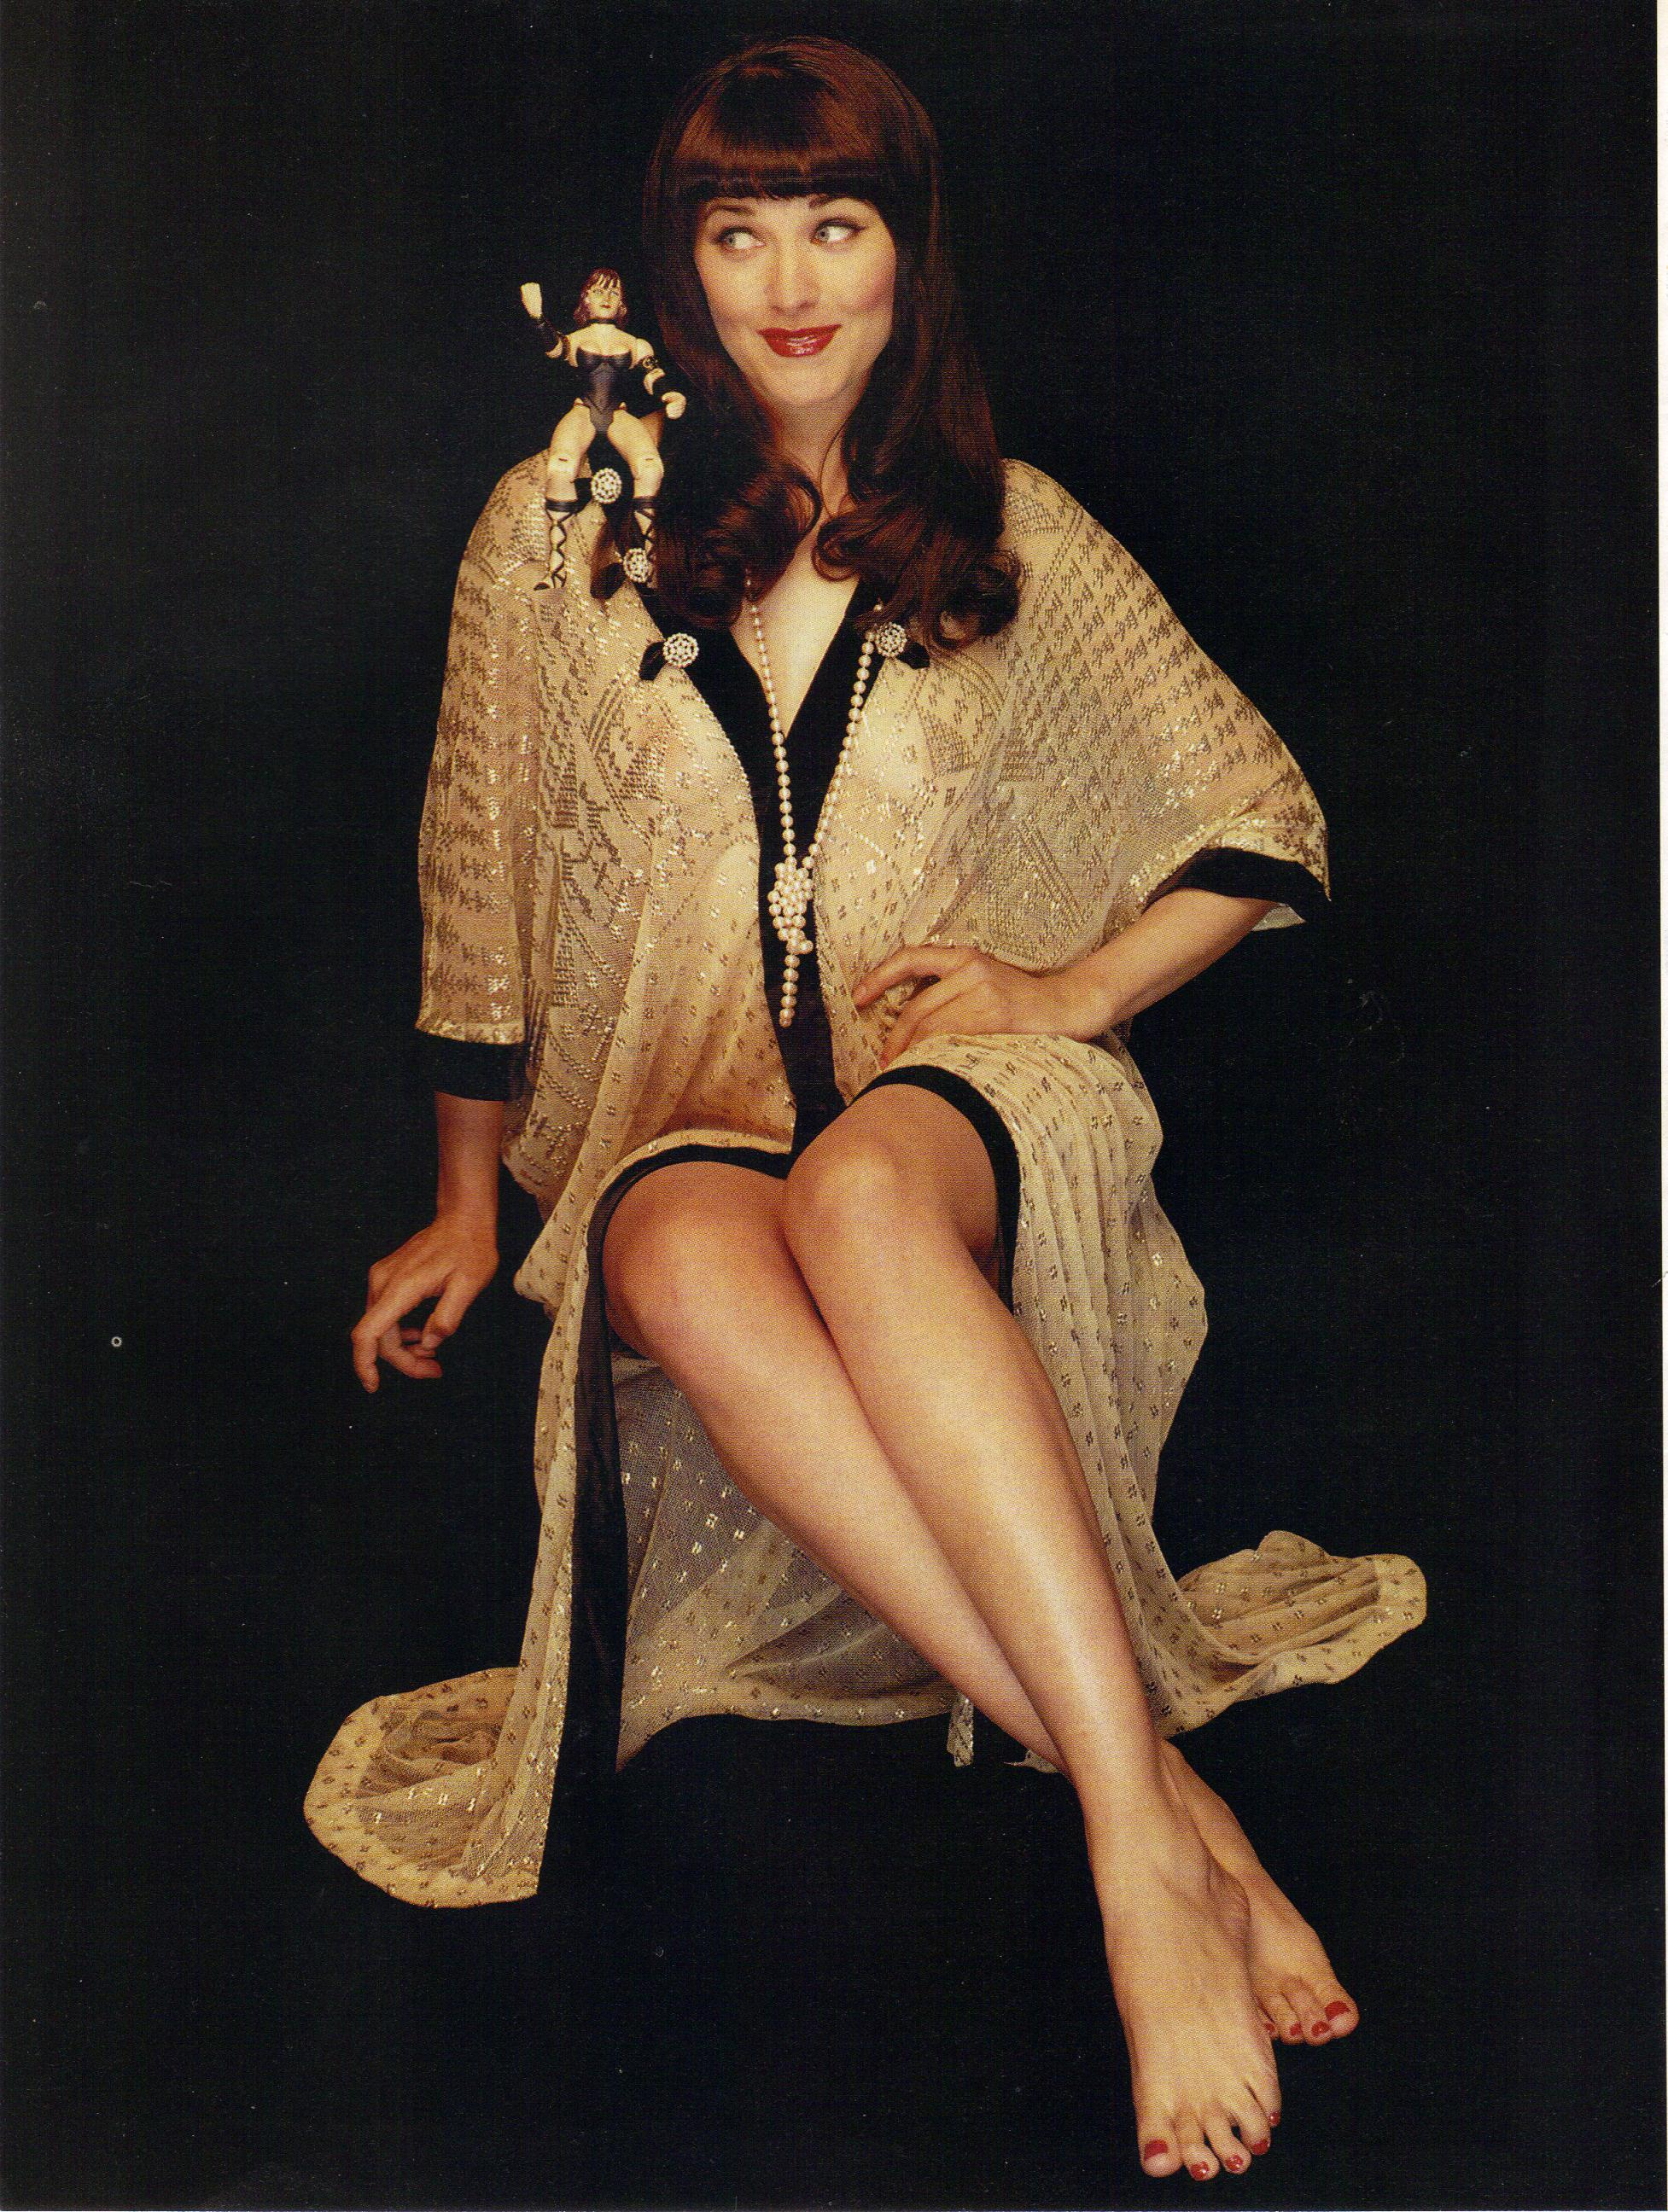 Julia Lehman Nude Pics